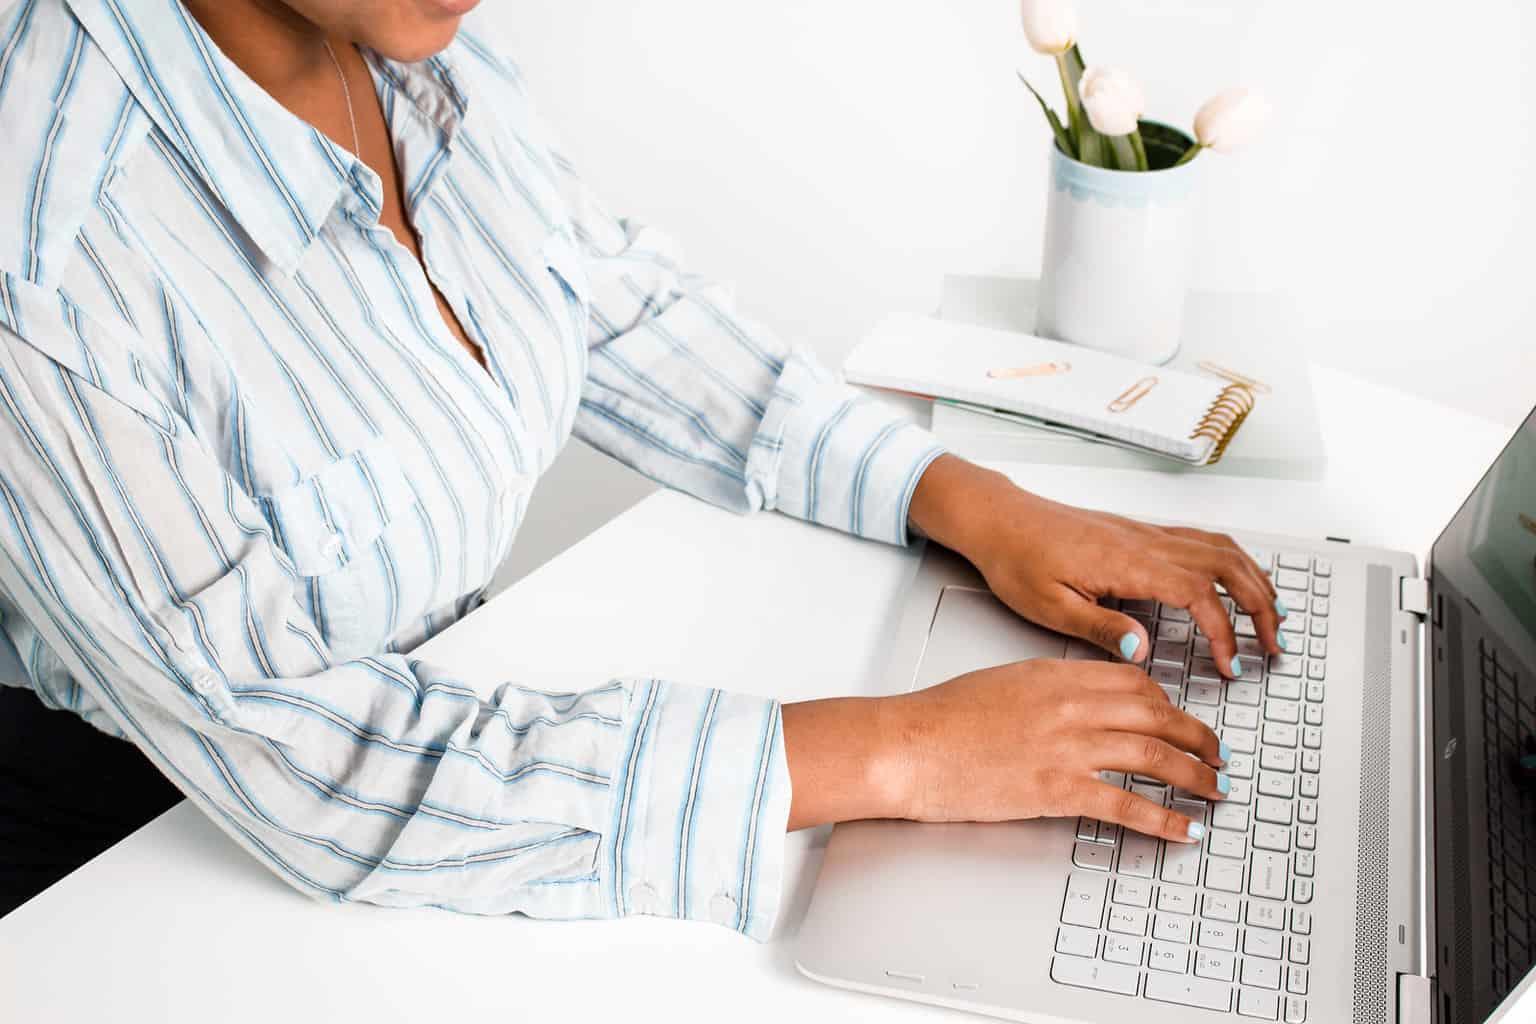 how to get your blog into Mediavine